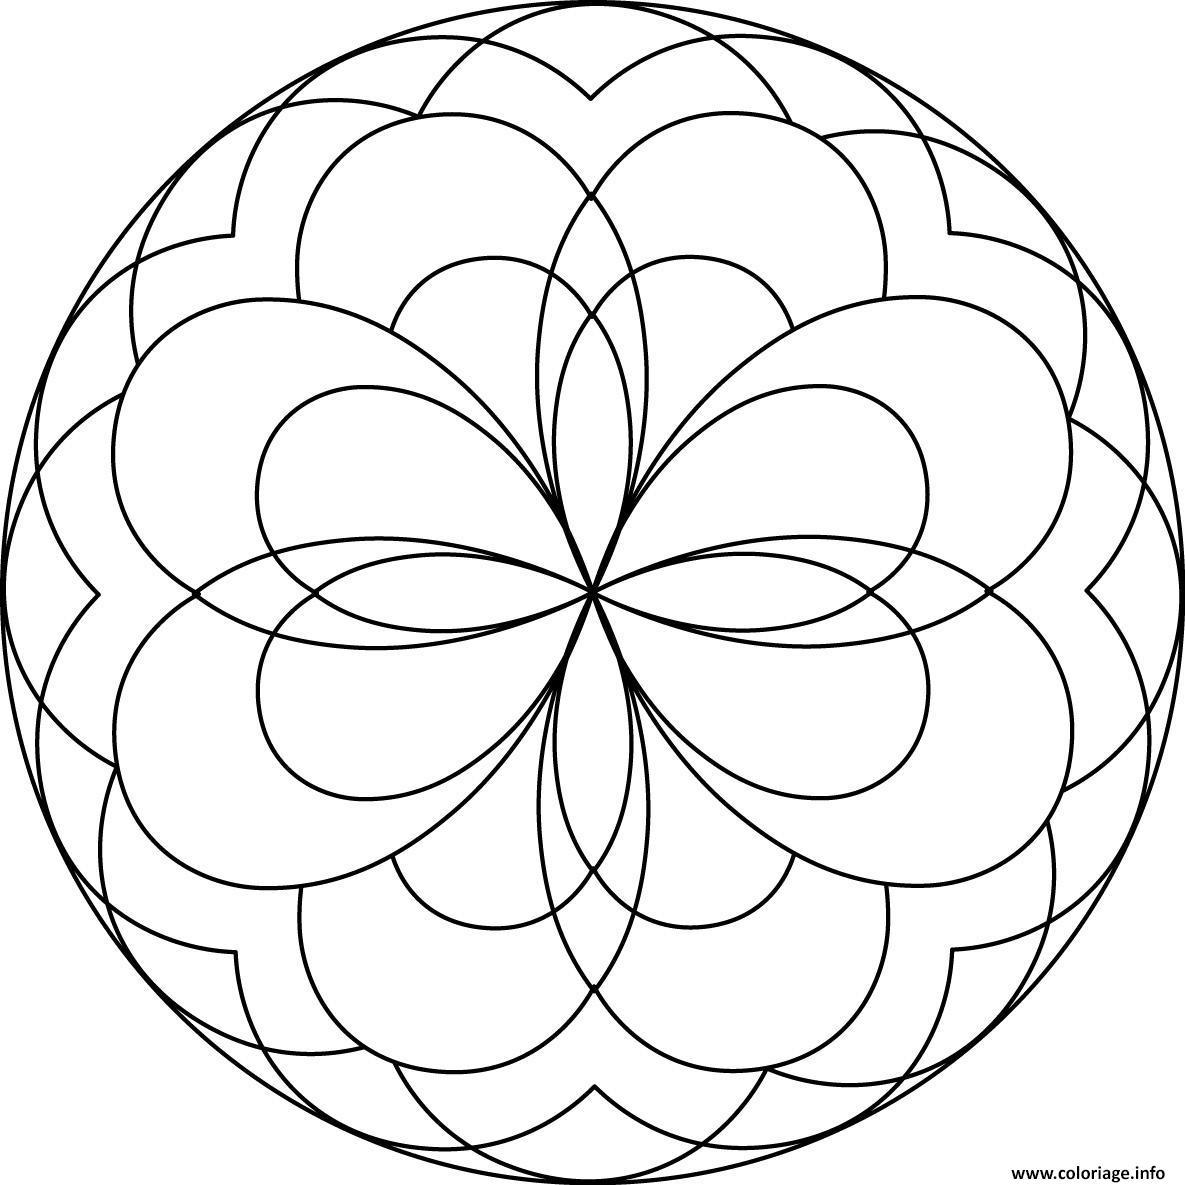 Coloriage Mandala Facile 60 Dessin à Mandala Facile À Imprimer